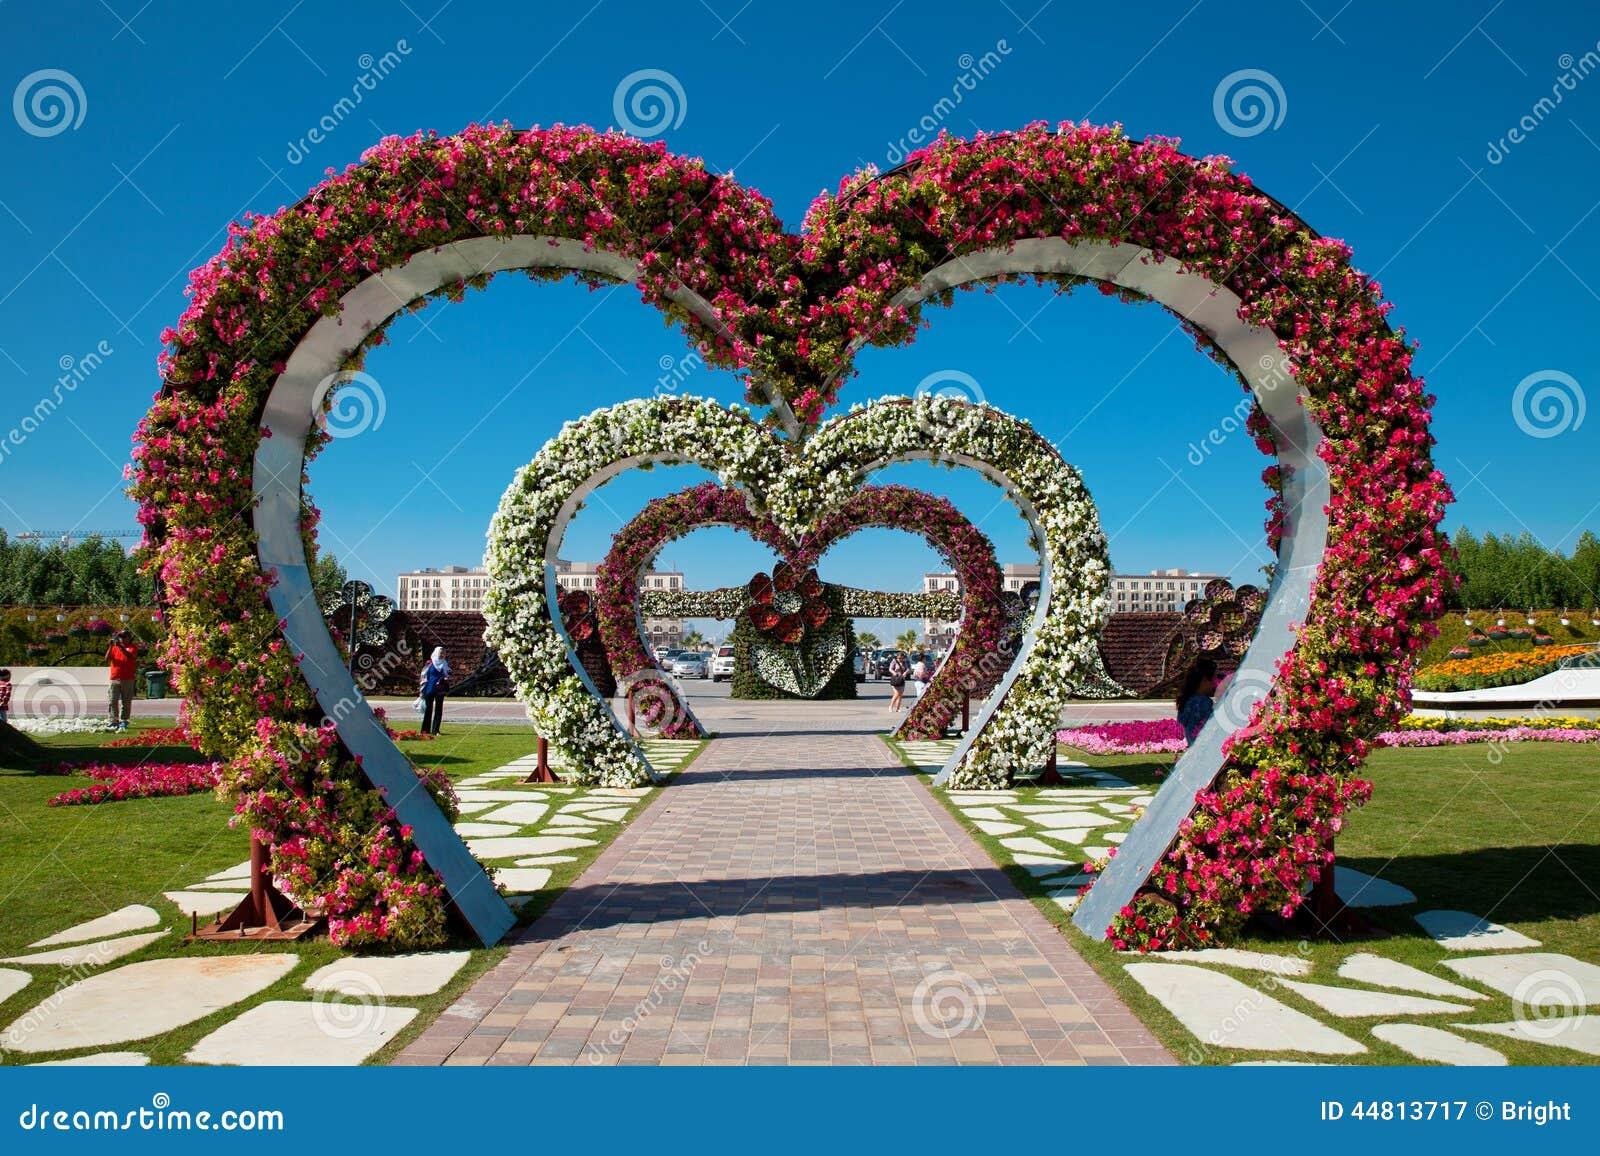 Jardines de flores dubai fotograf a editorial imagen de for Cancion jardin de rosas